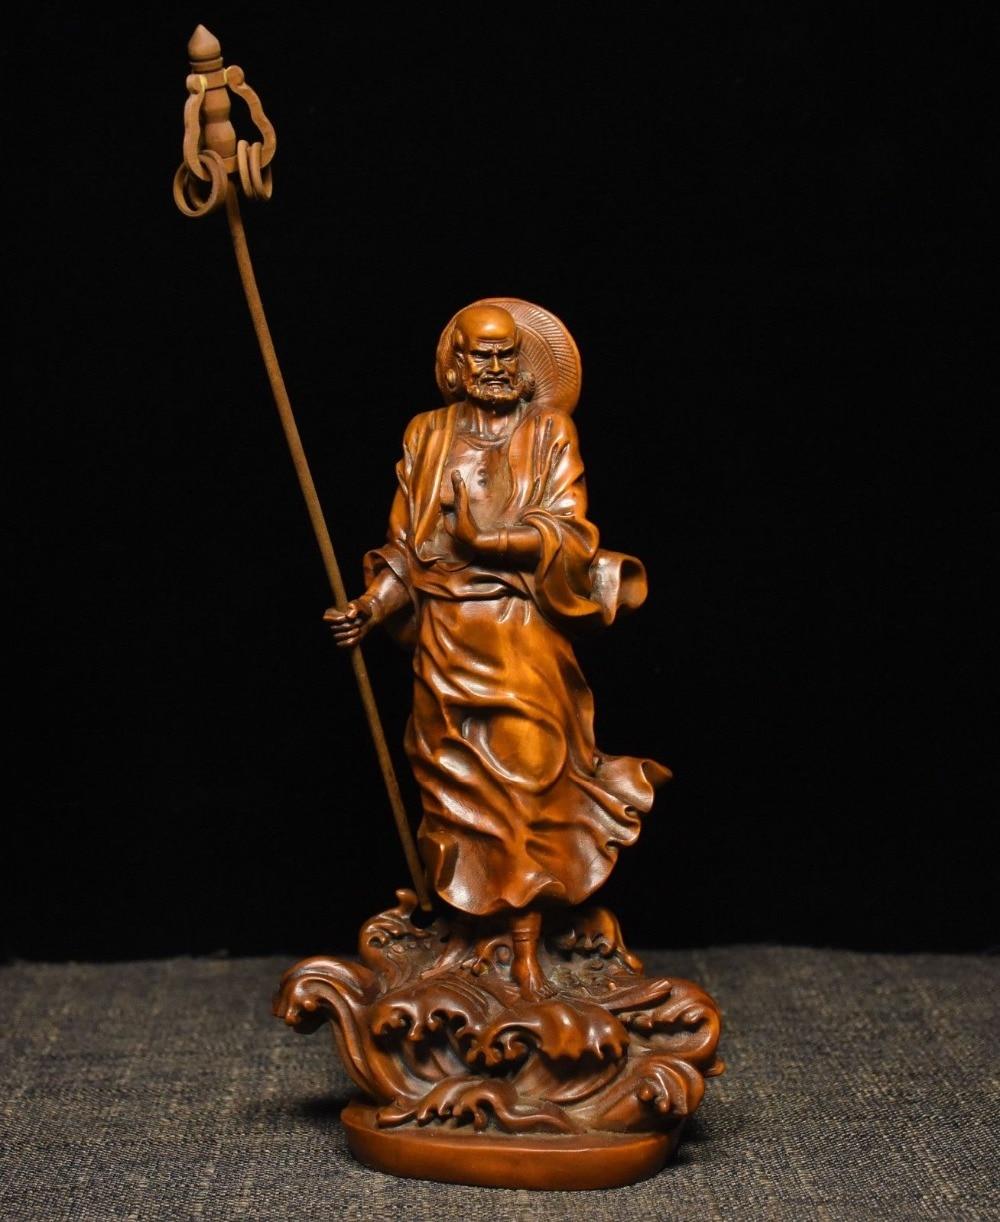 Soporte de madera de boj para budismo chino de Navidad, estatua de Buda Damo Bodhidharma Dharma, halloween